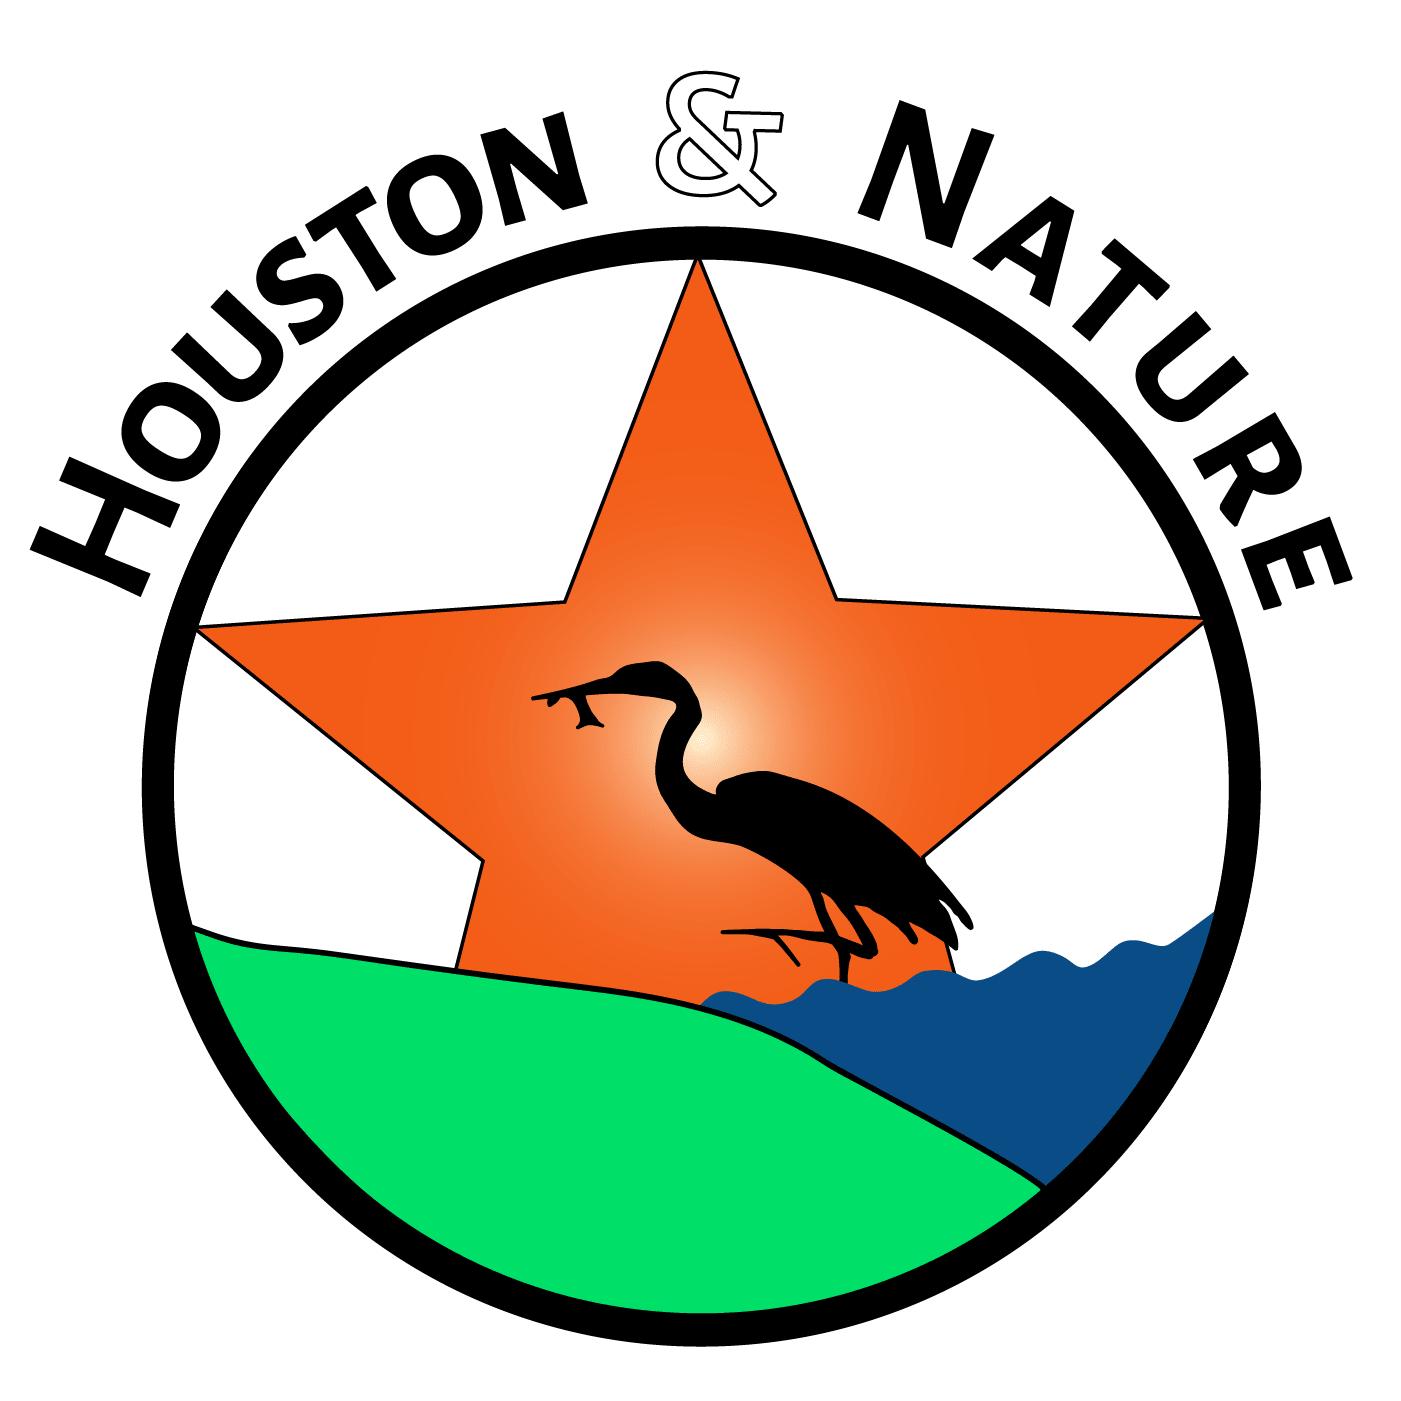 Houston and Nature show art